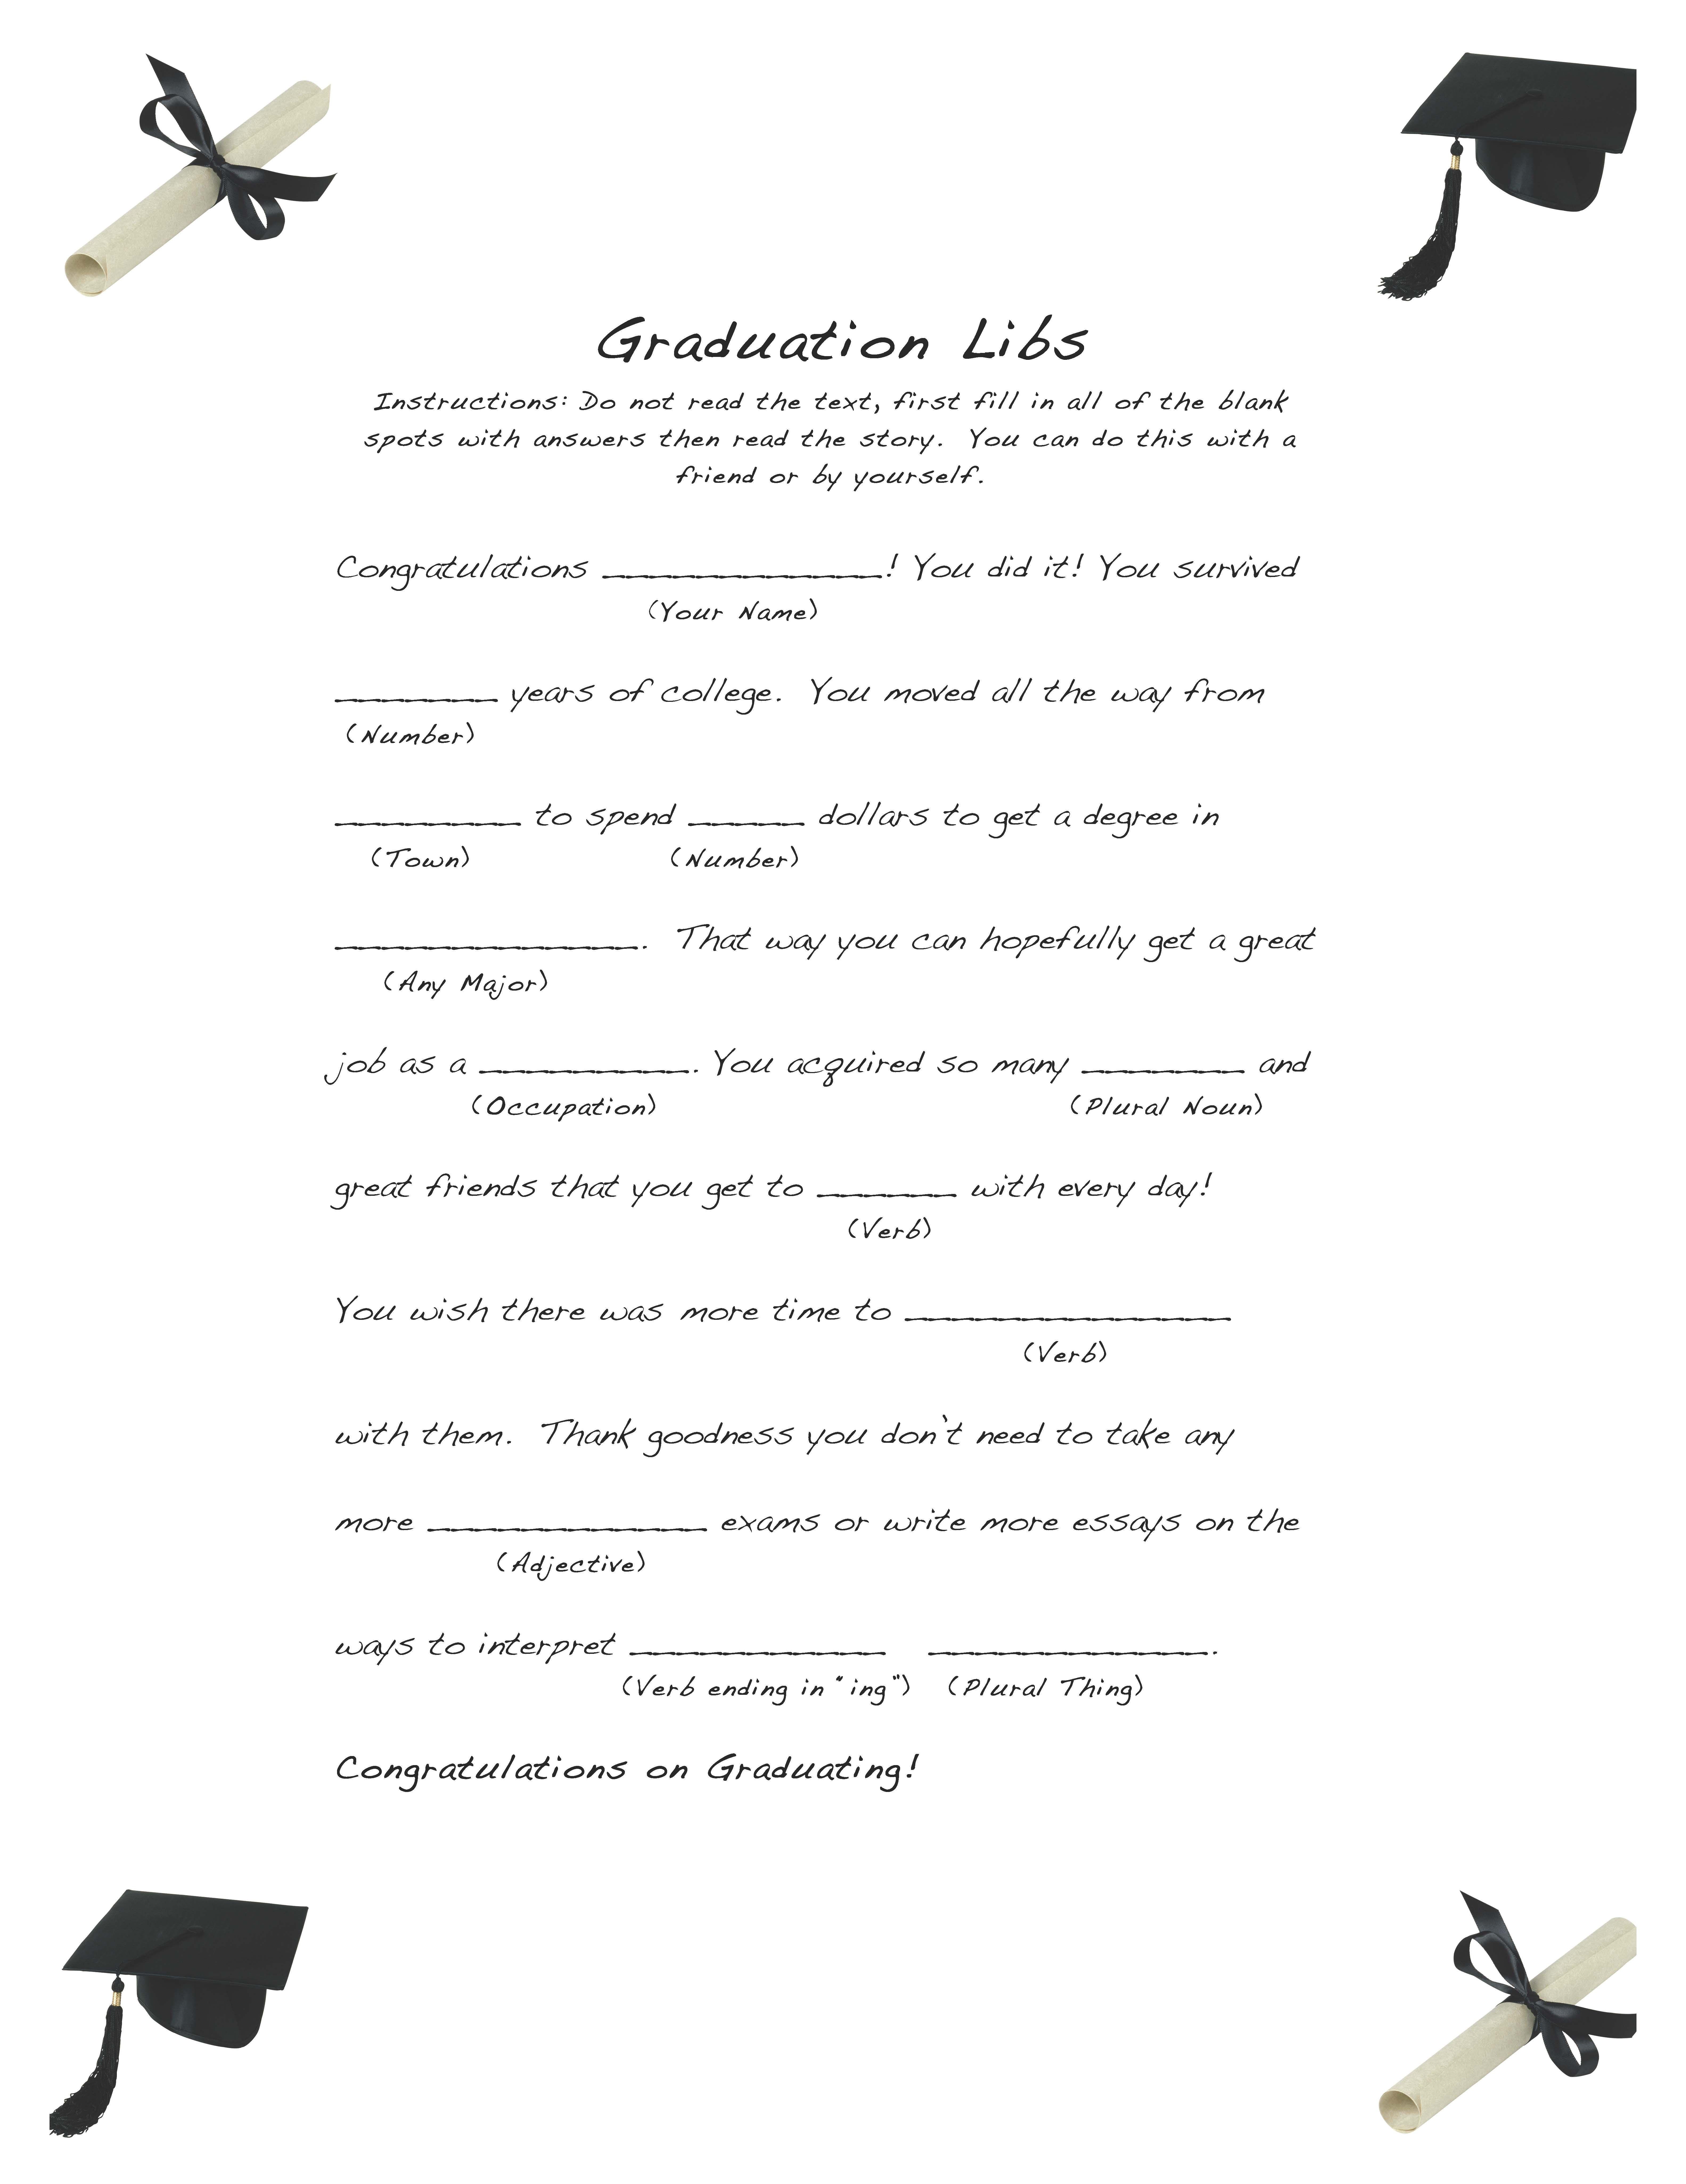 Free Graduation Libs